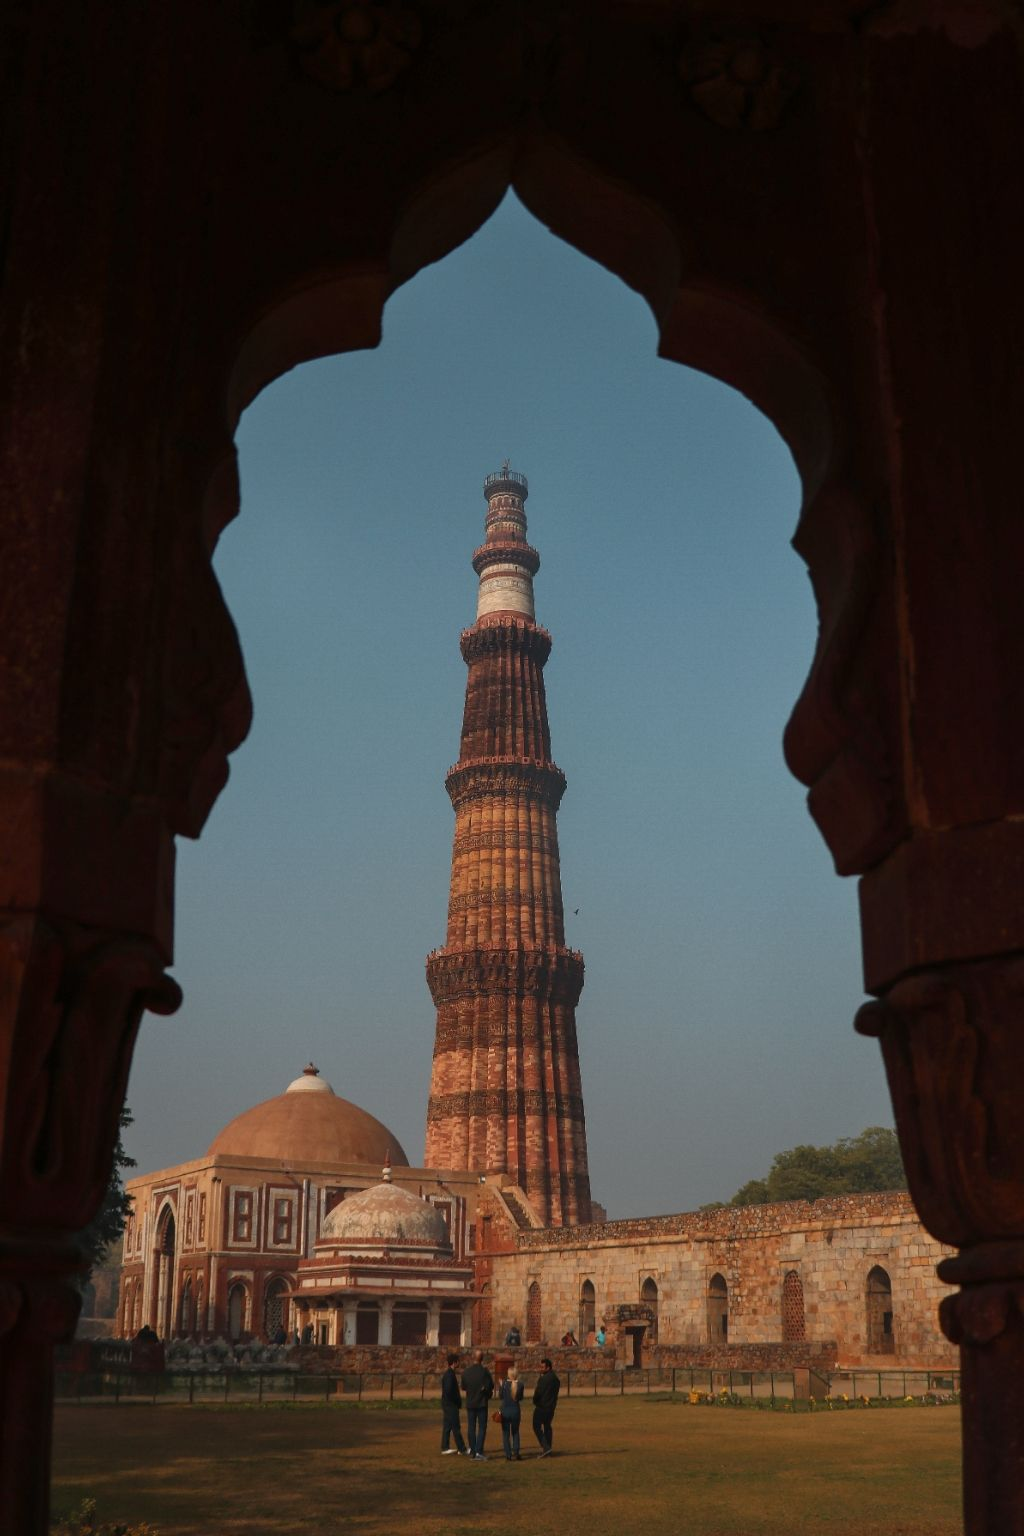 Photo of Qutub Minar By Manav Chugh